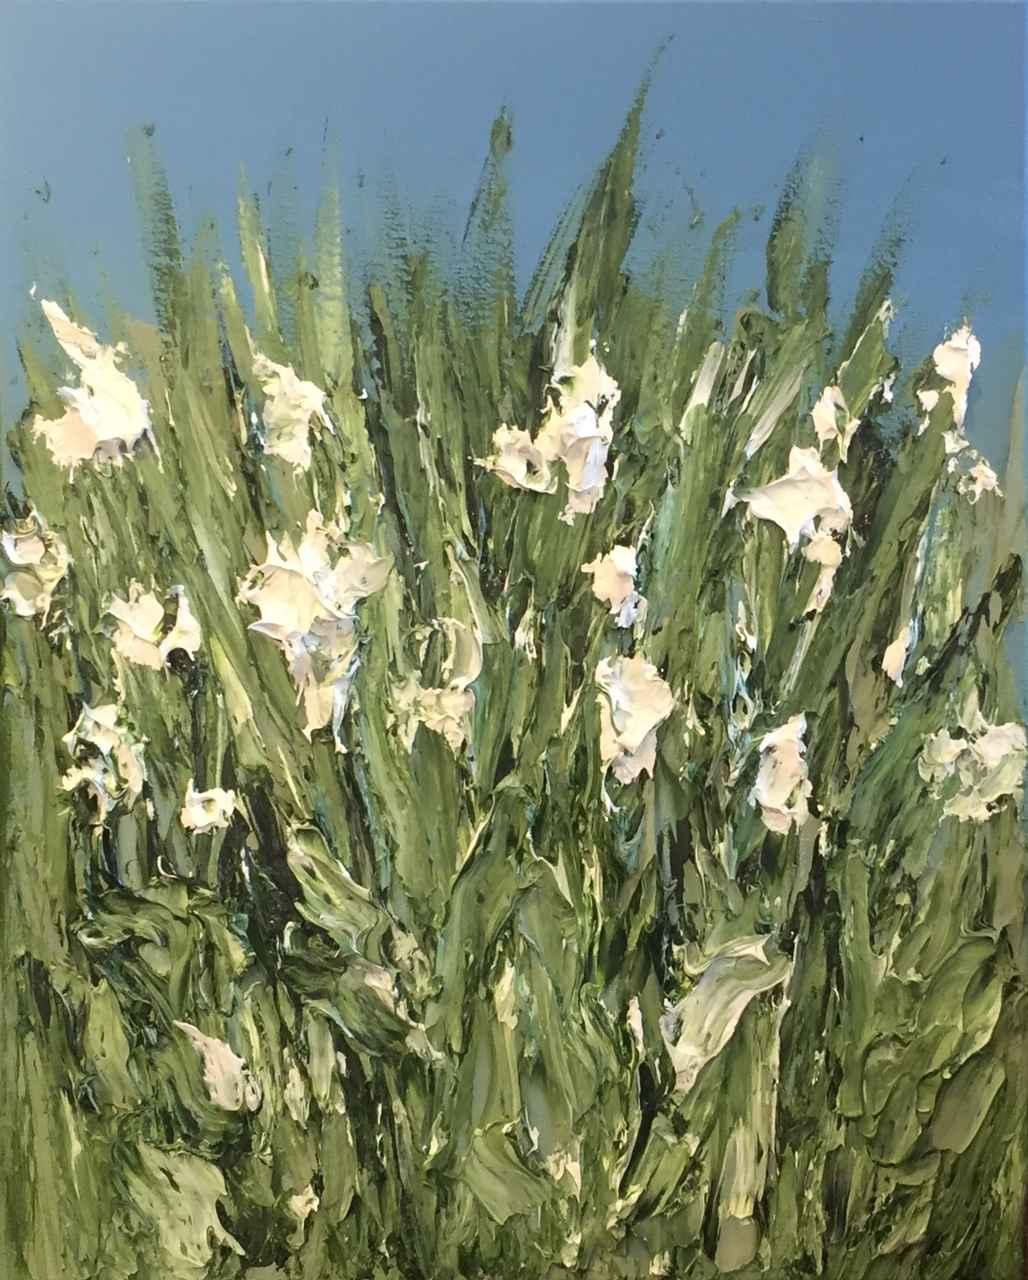 Summer Joy #2 by  Steve Lyons - Masterpiece Online